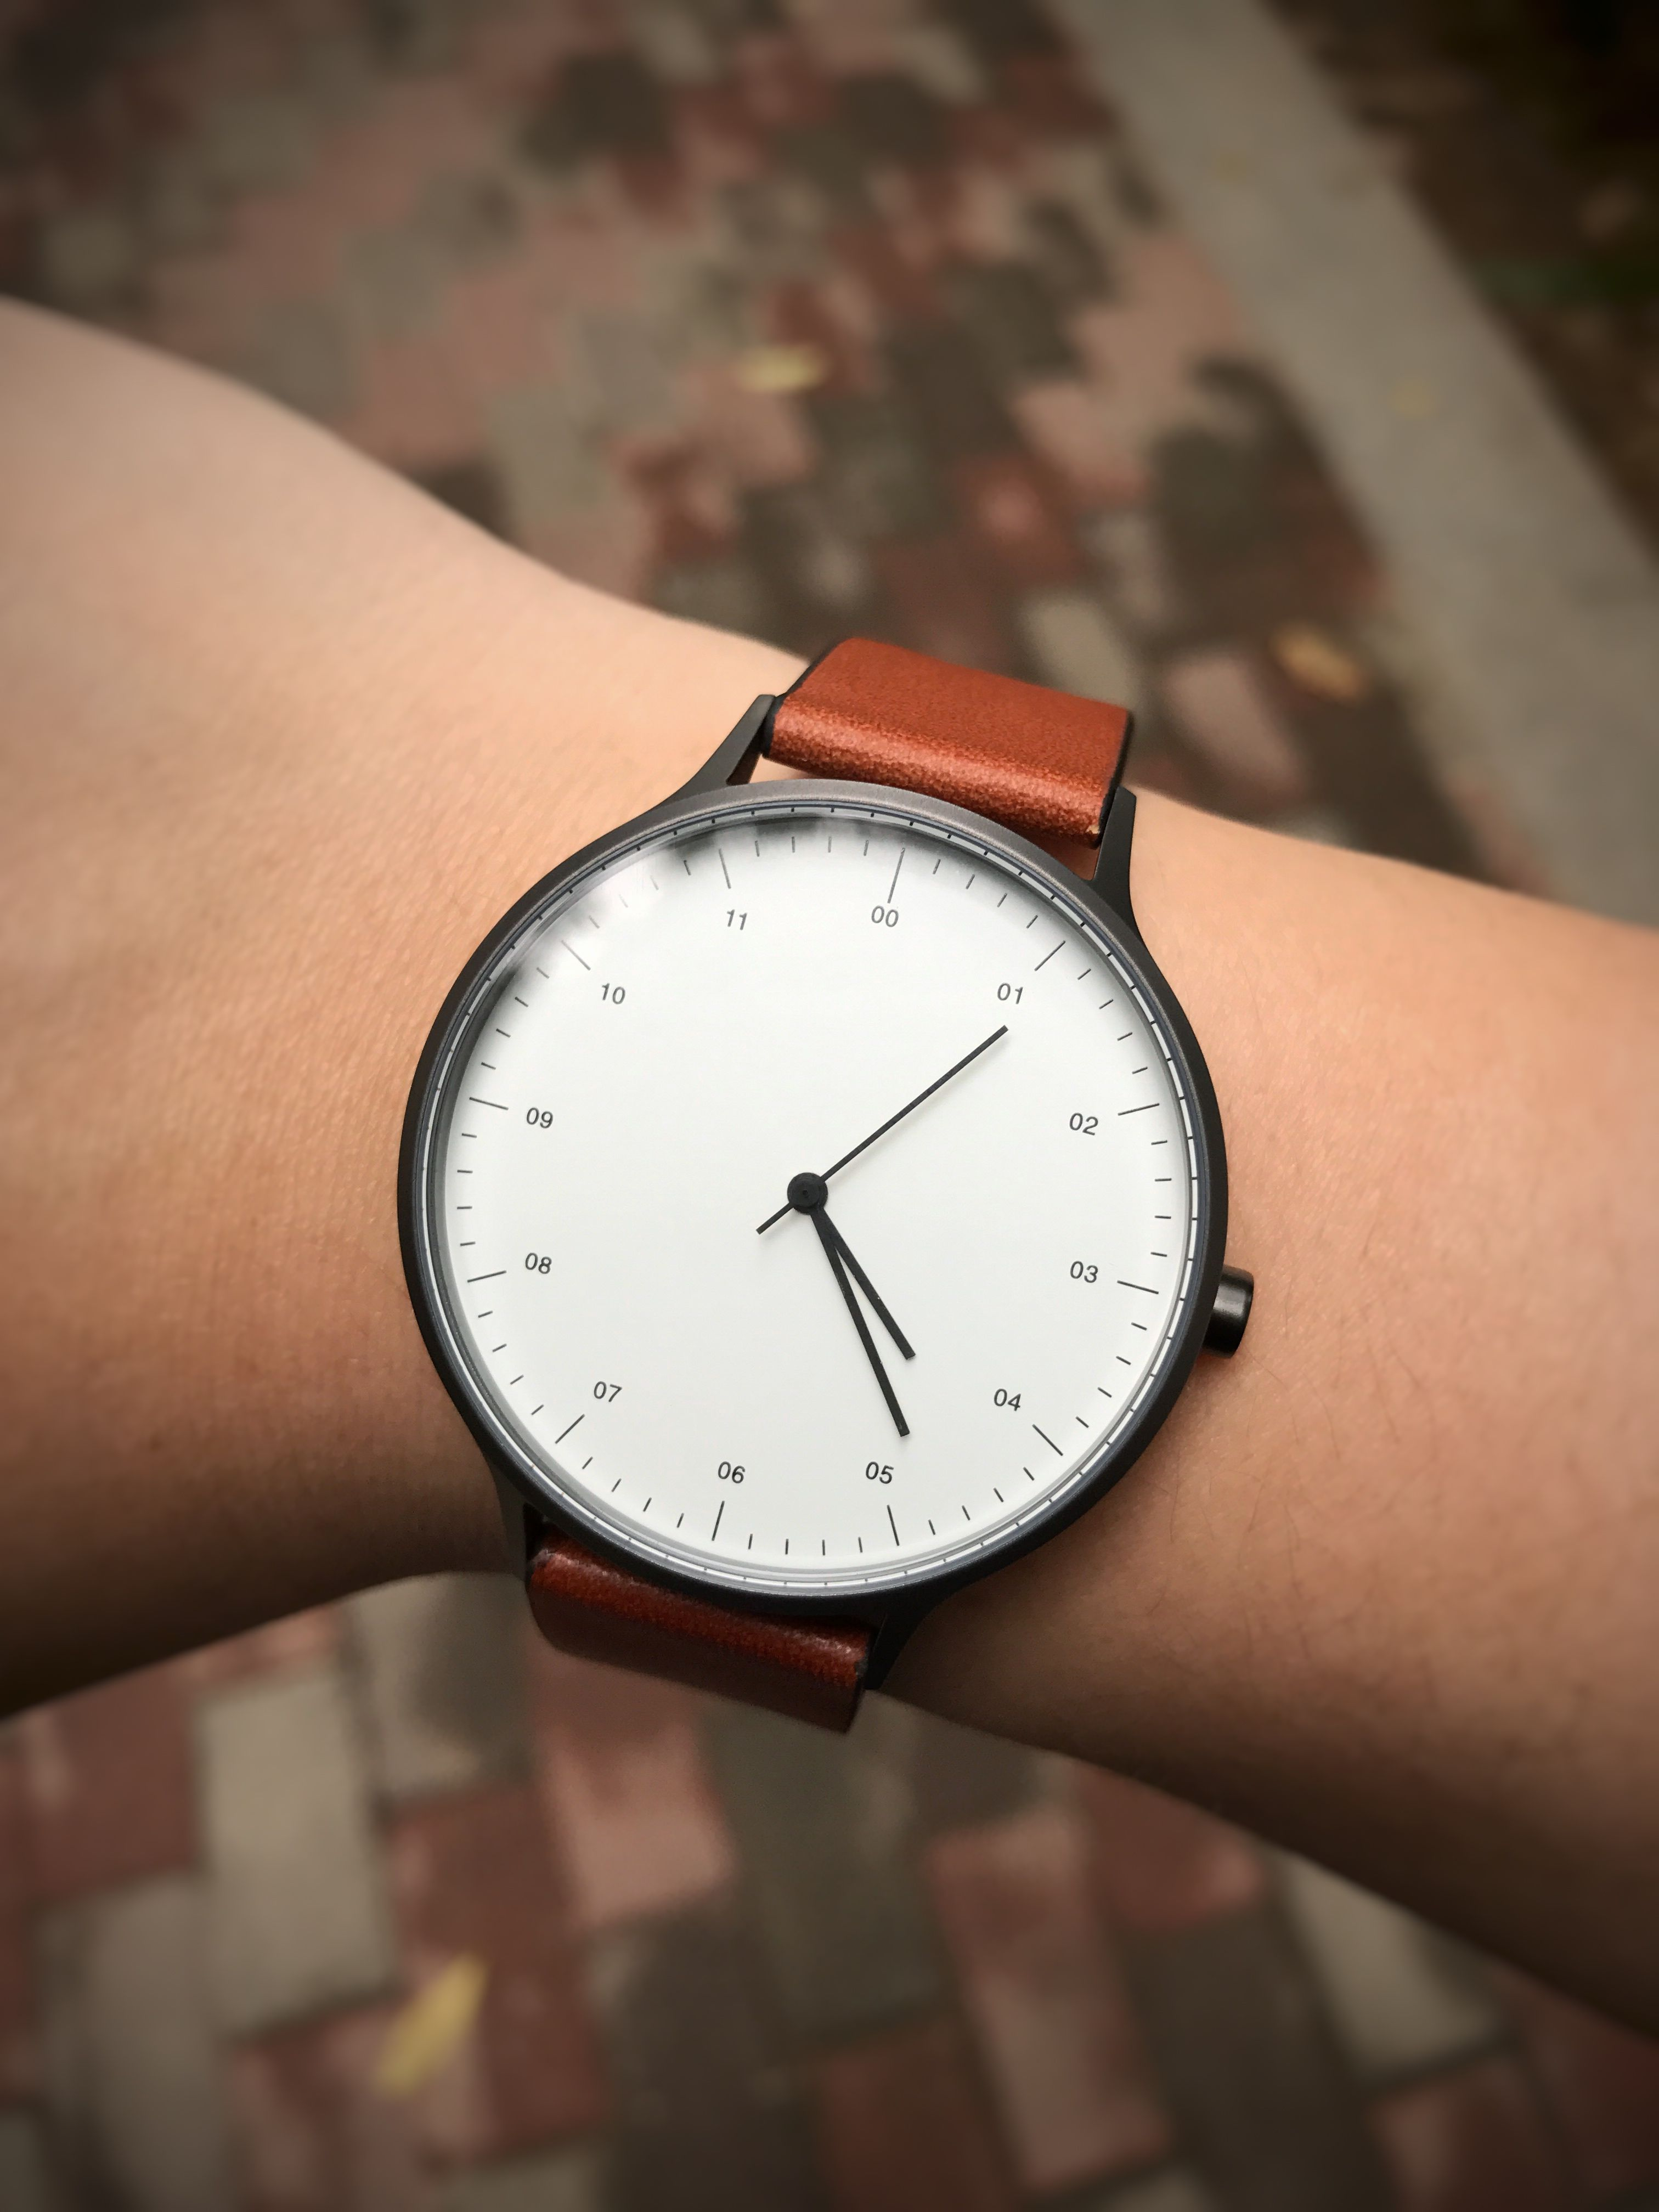 B302 Gunmetal Grey Watch On Tan Leather Strap Tan Leather Strap